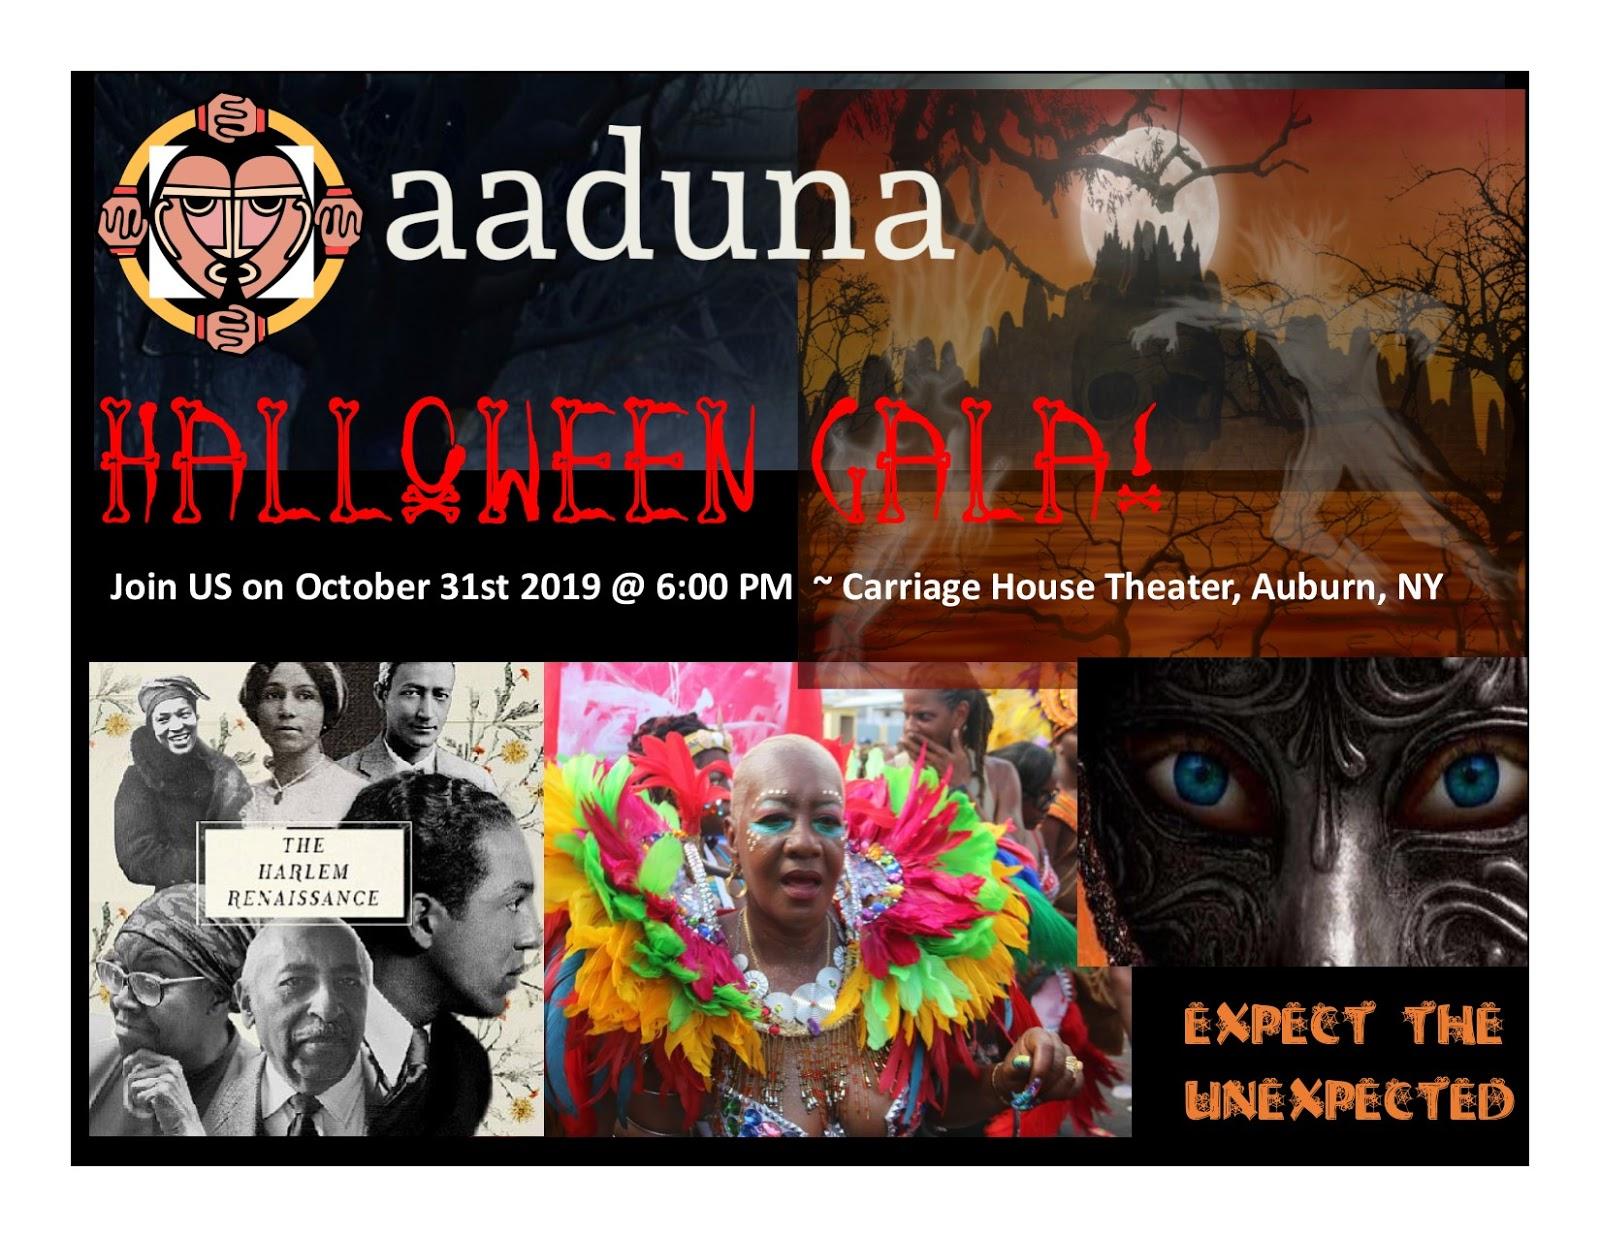 aaduna gala carriage house theater auburn ny 2019